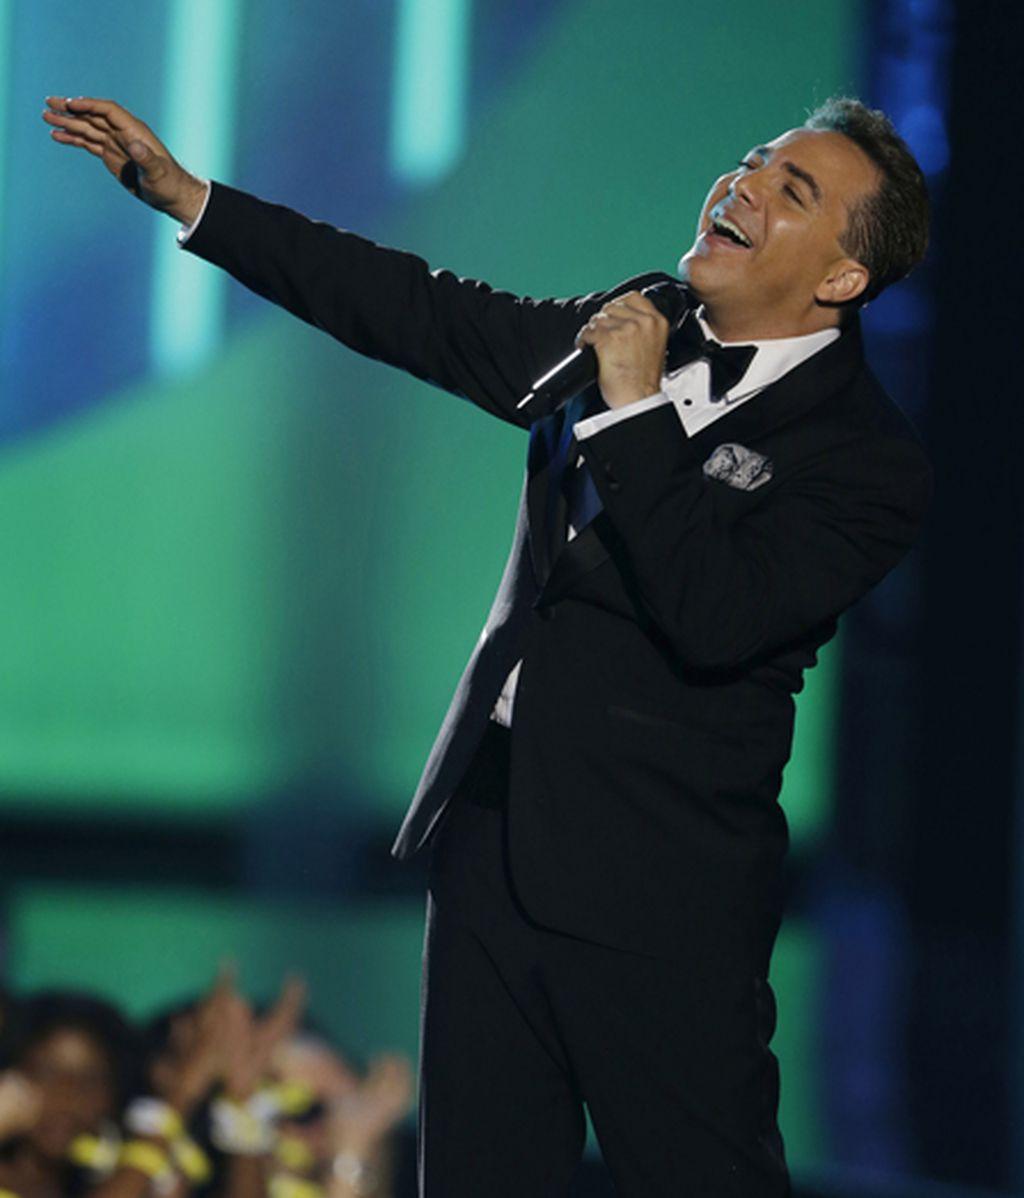 El cantante mexicano Cristian Castro